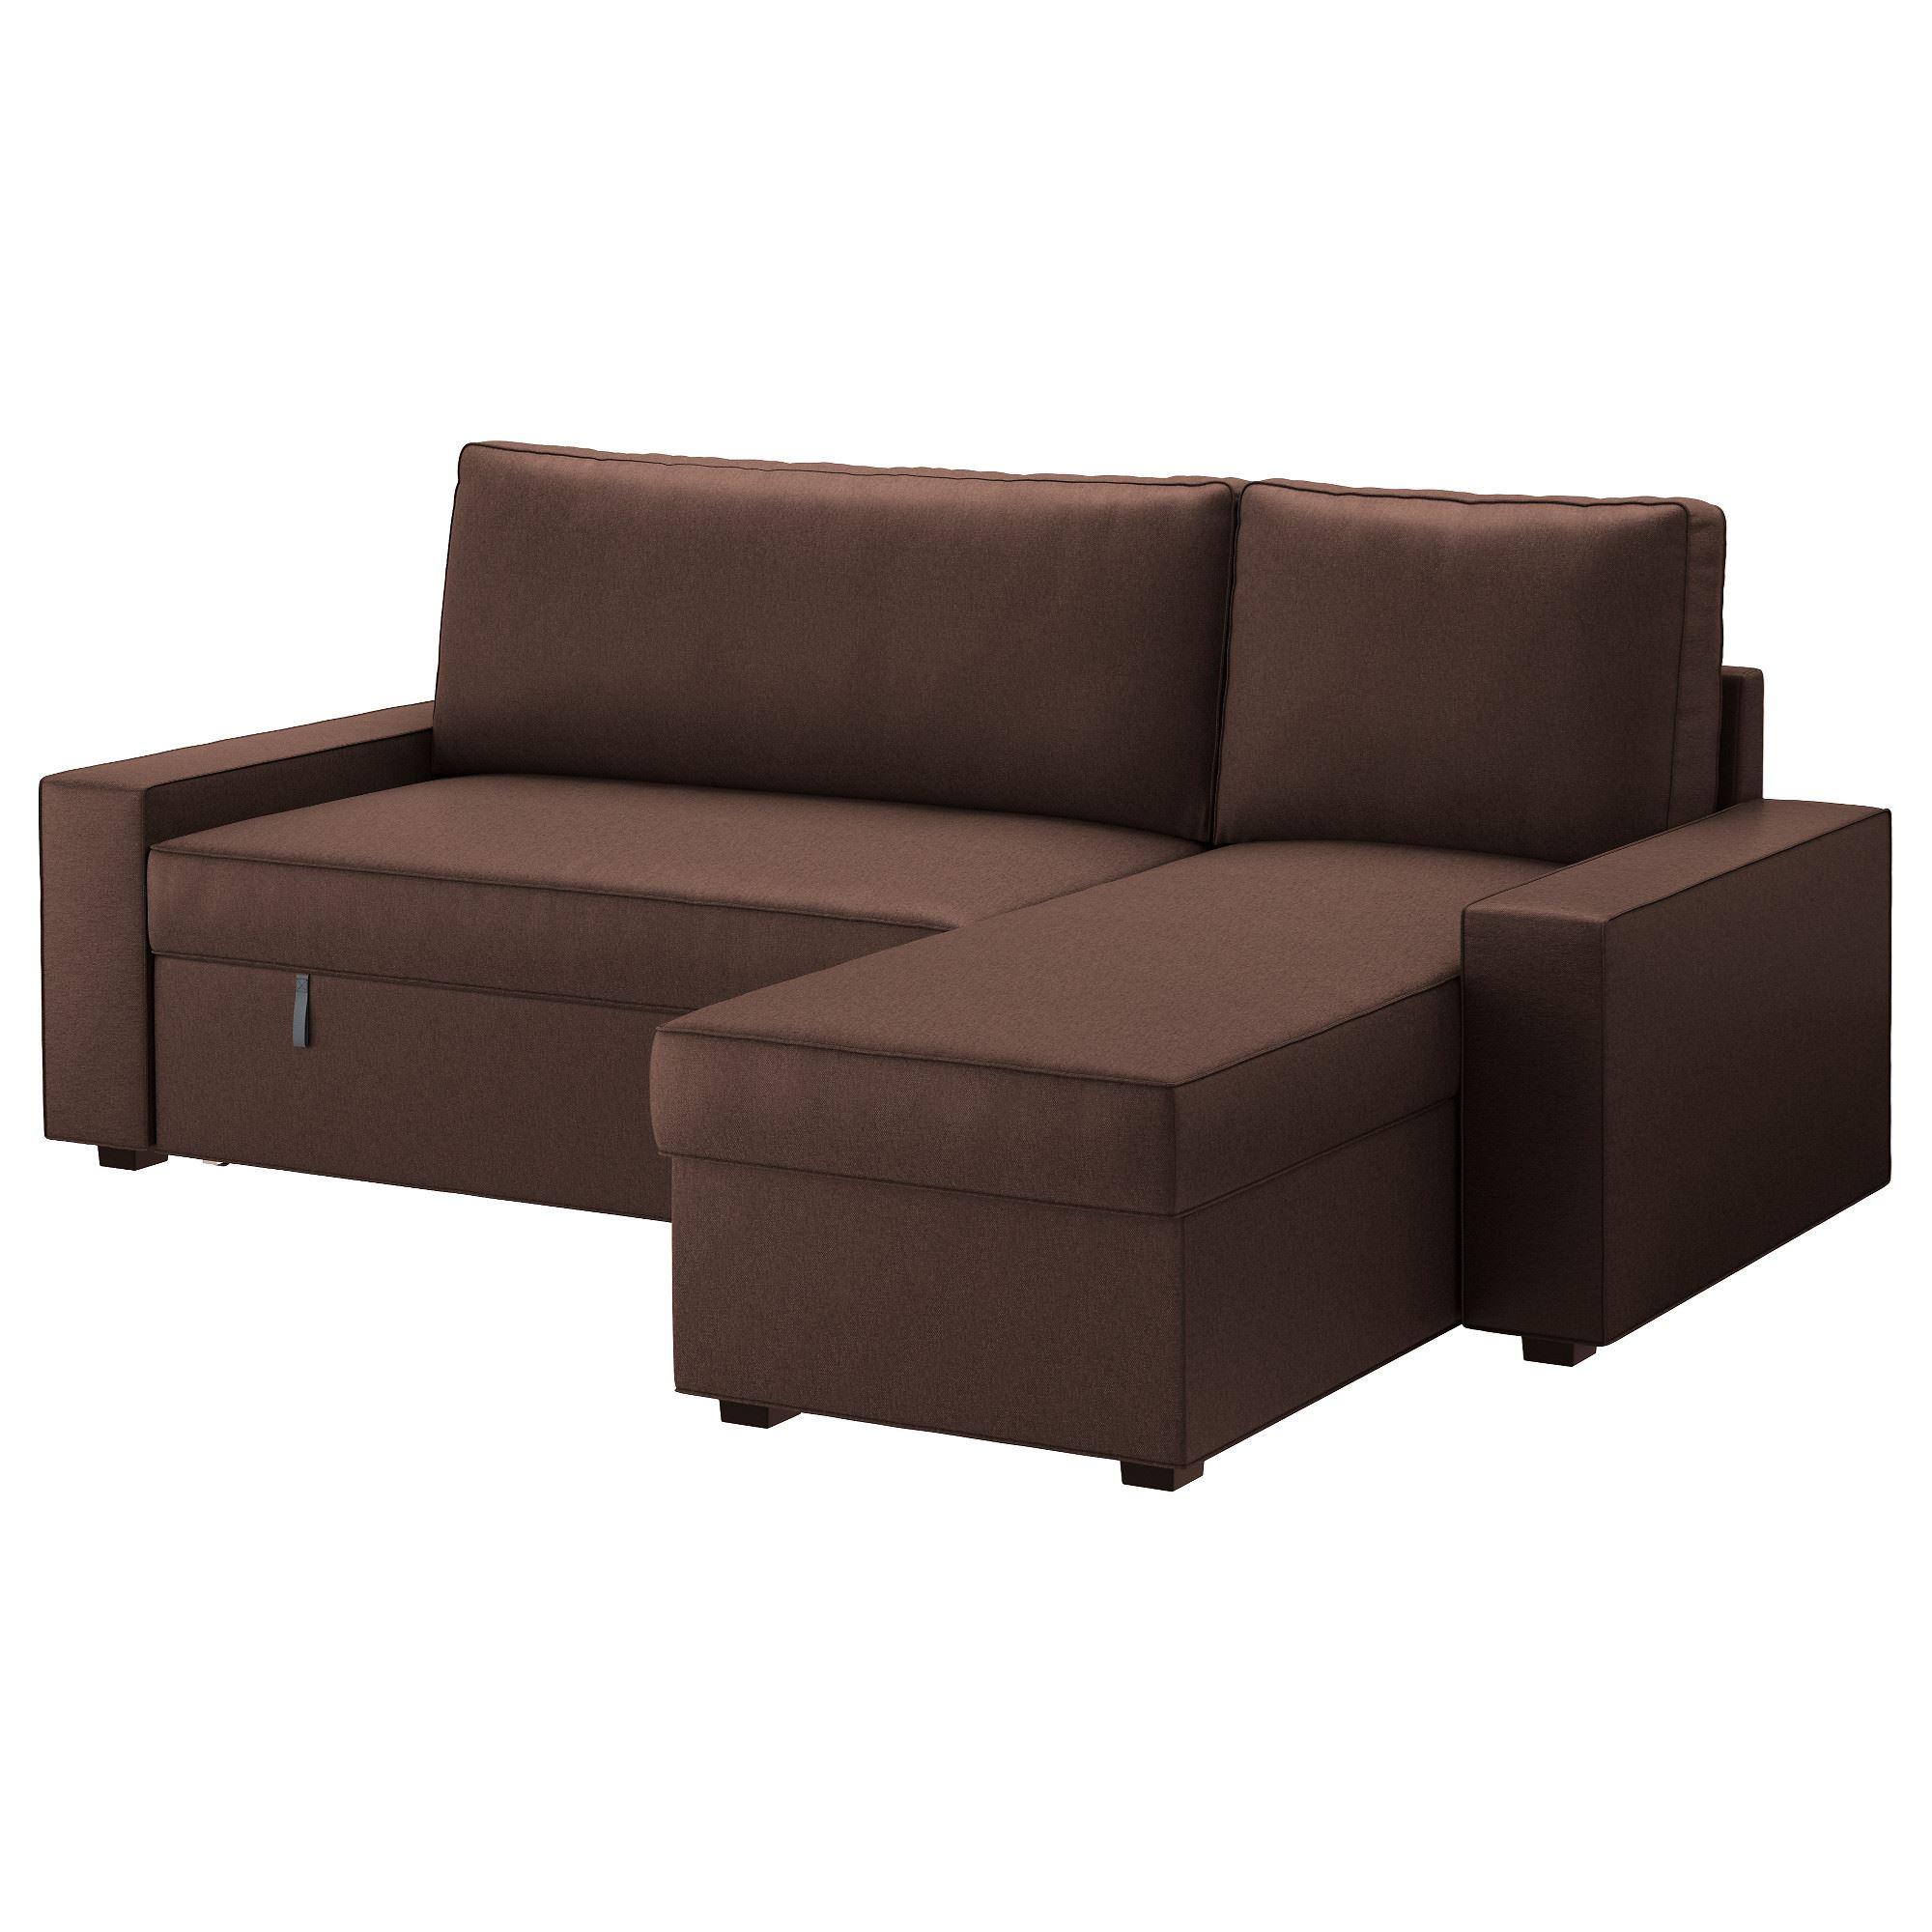 Vilasund Marieby Corner Sofa Bed Borred